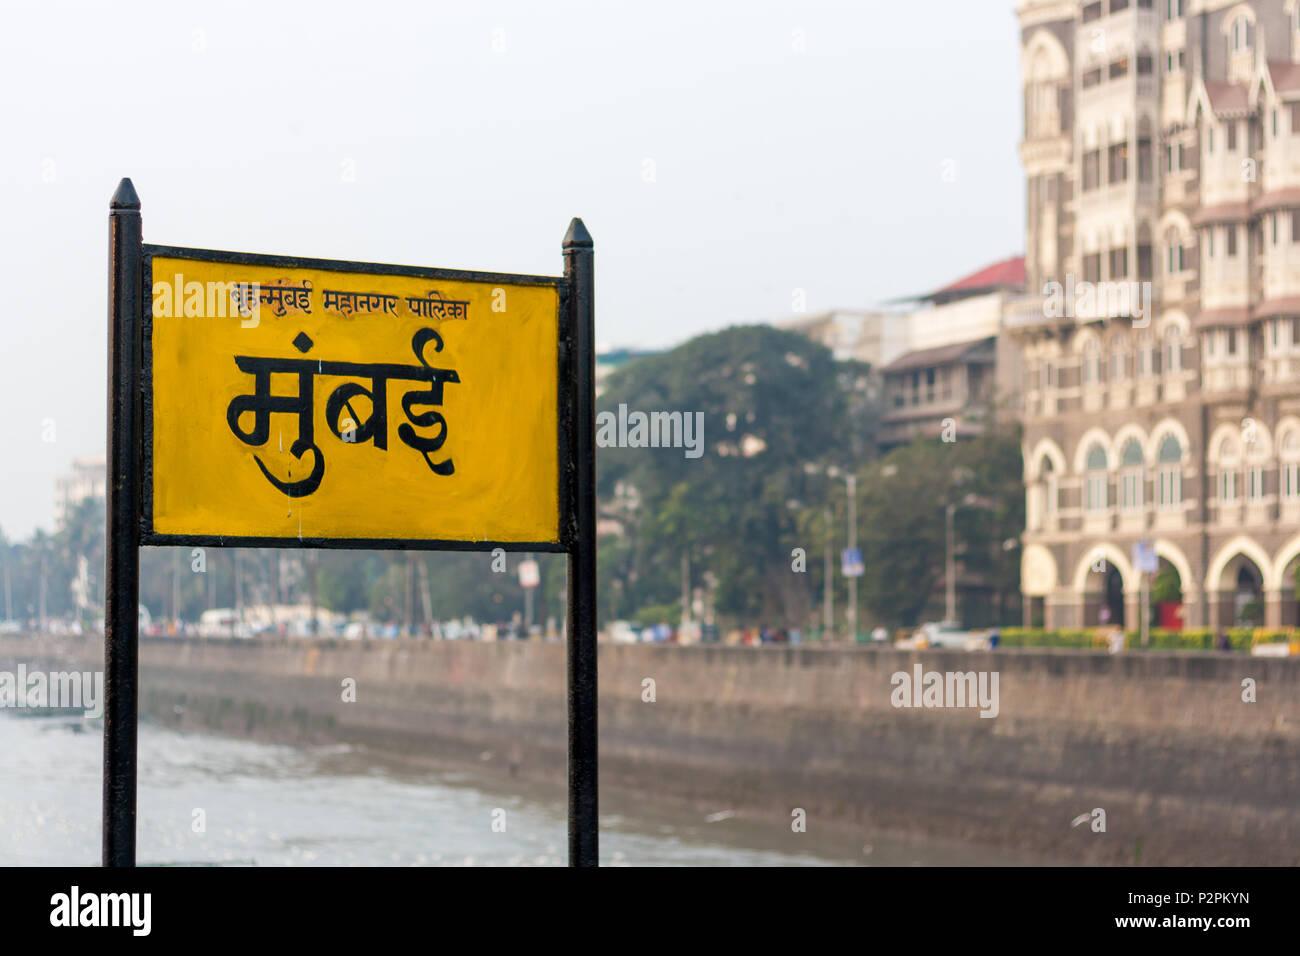 Mumbai Signboard in Marathi Language at Gateway of India, Mumbai - Stock Image